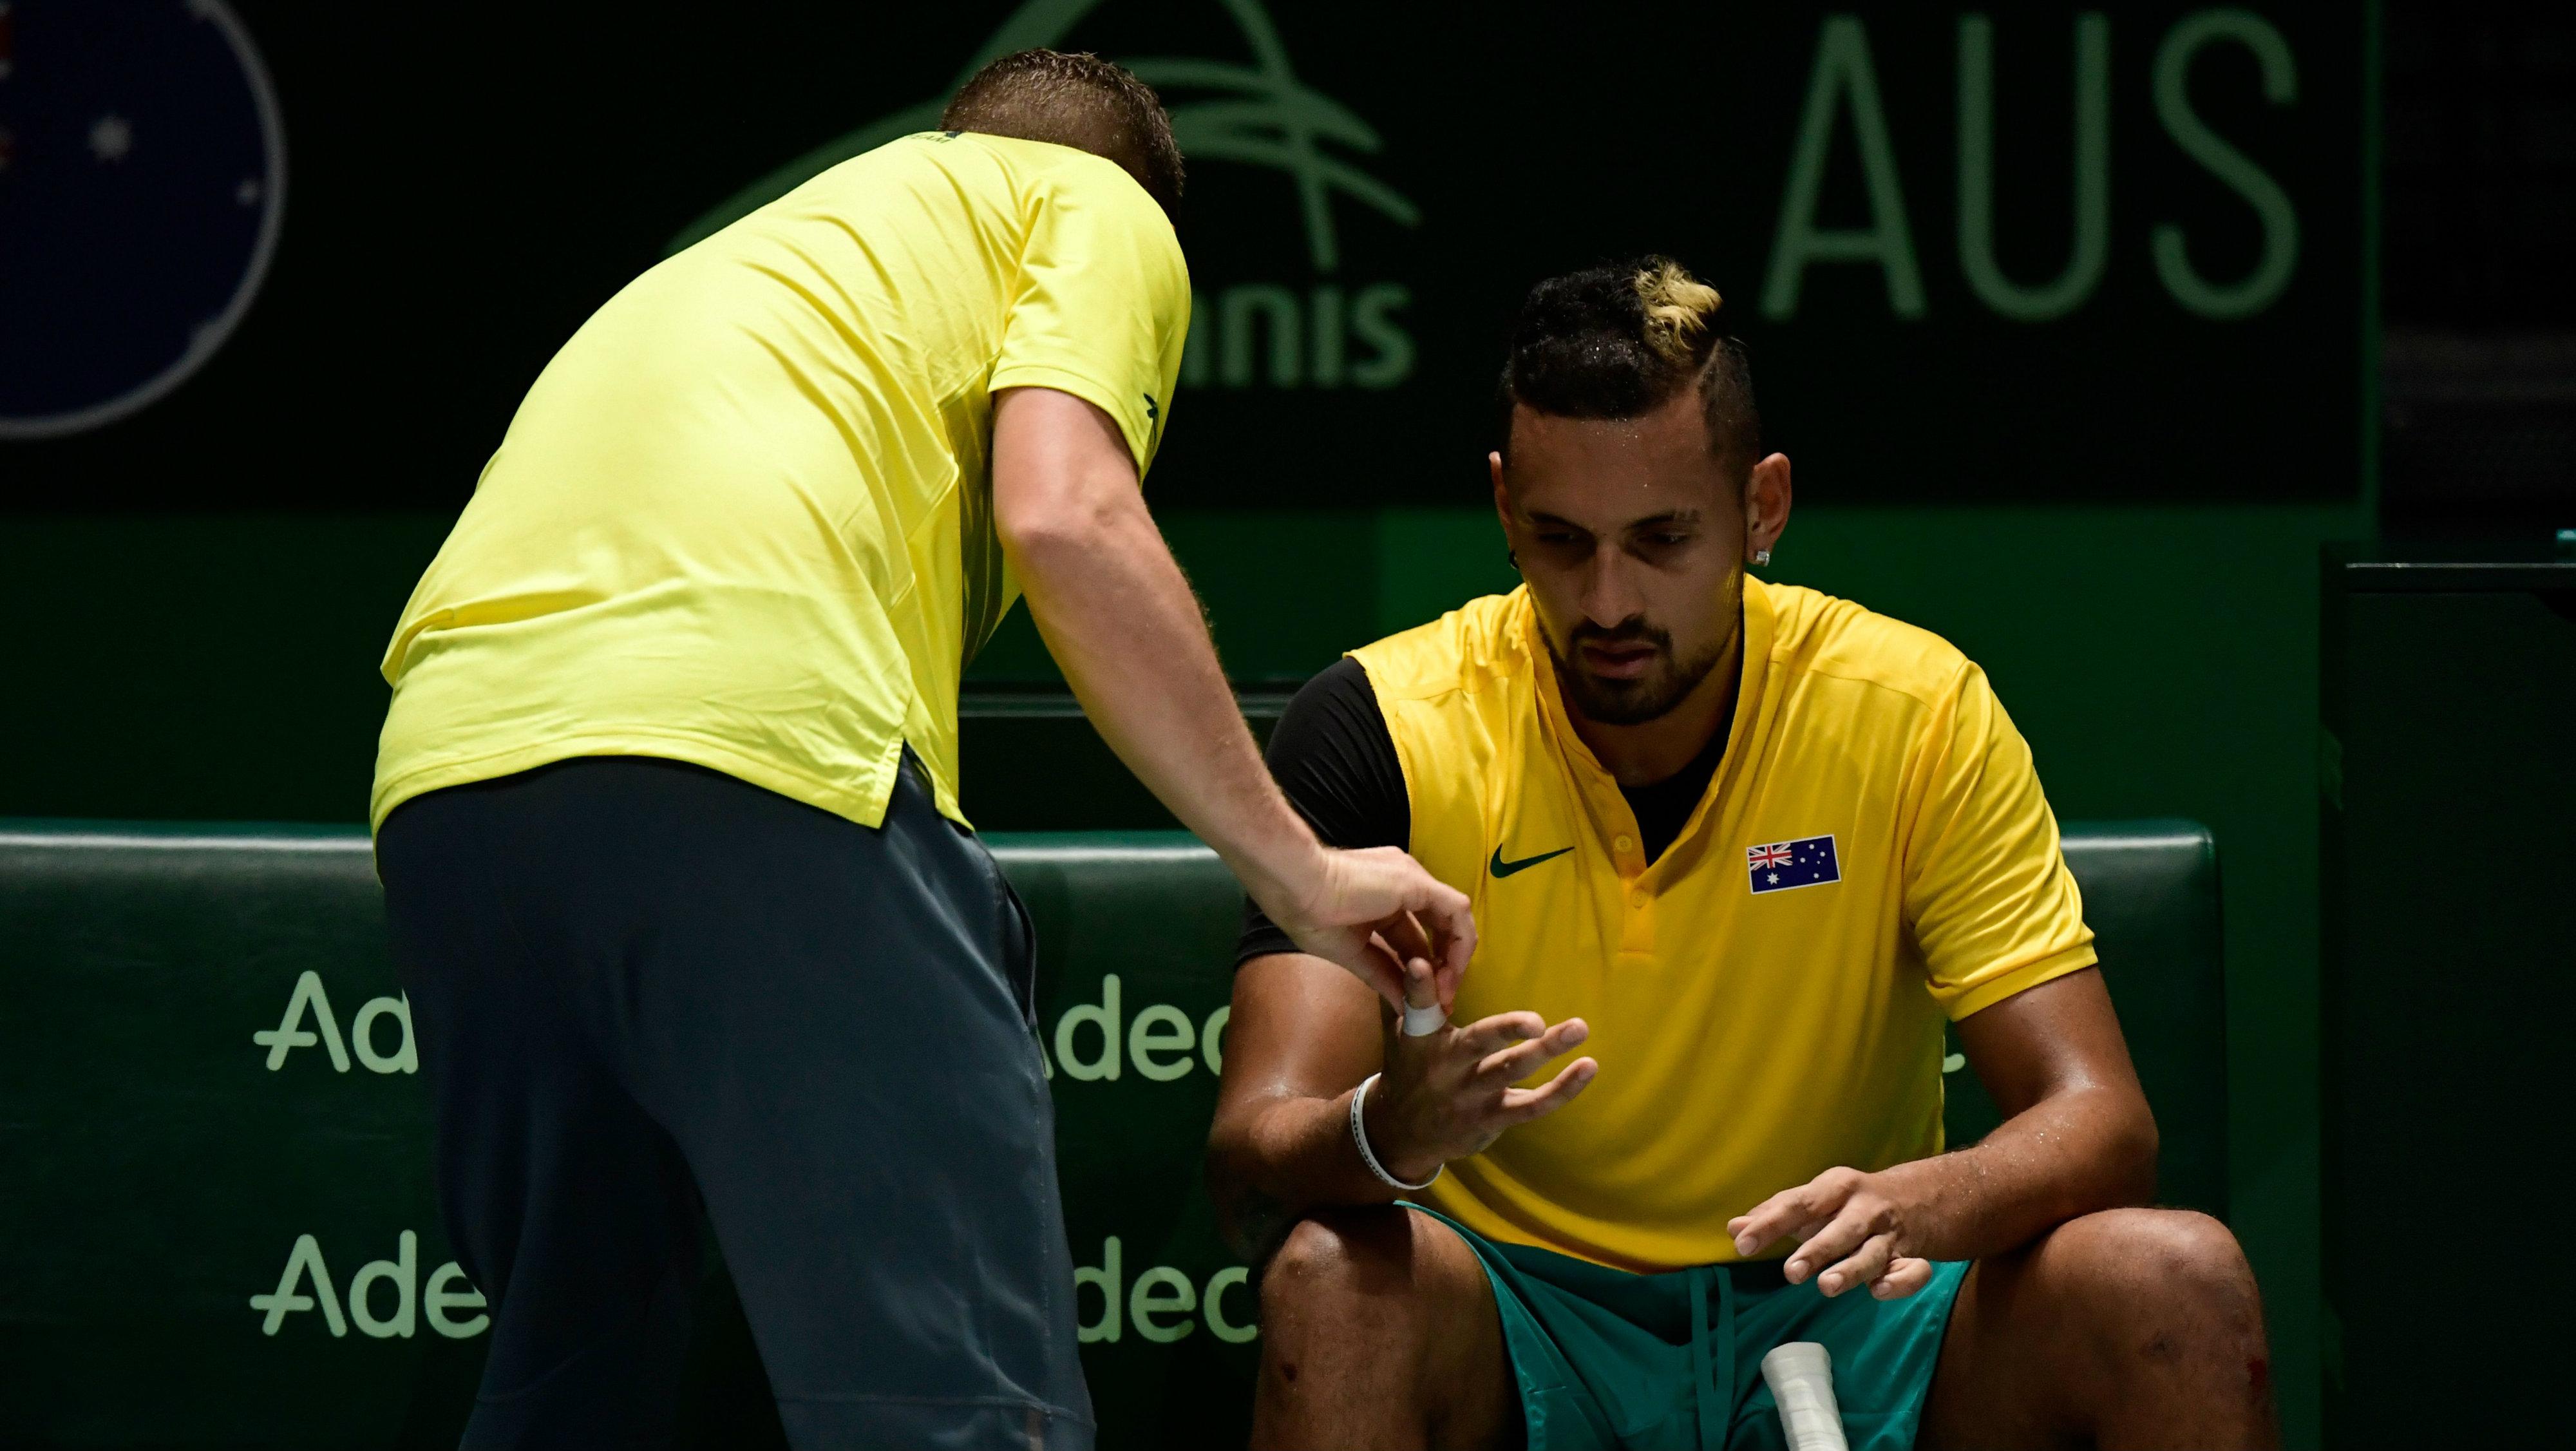 Davis Cup: Todd Woodbridge questions Nick Kyrgios commitment after Australia's quarter-final exit